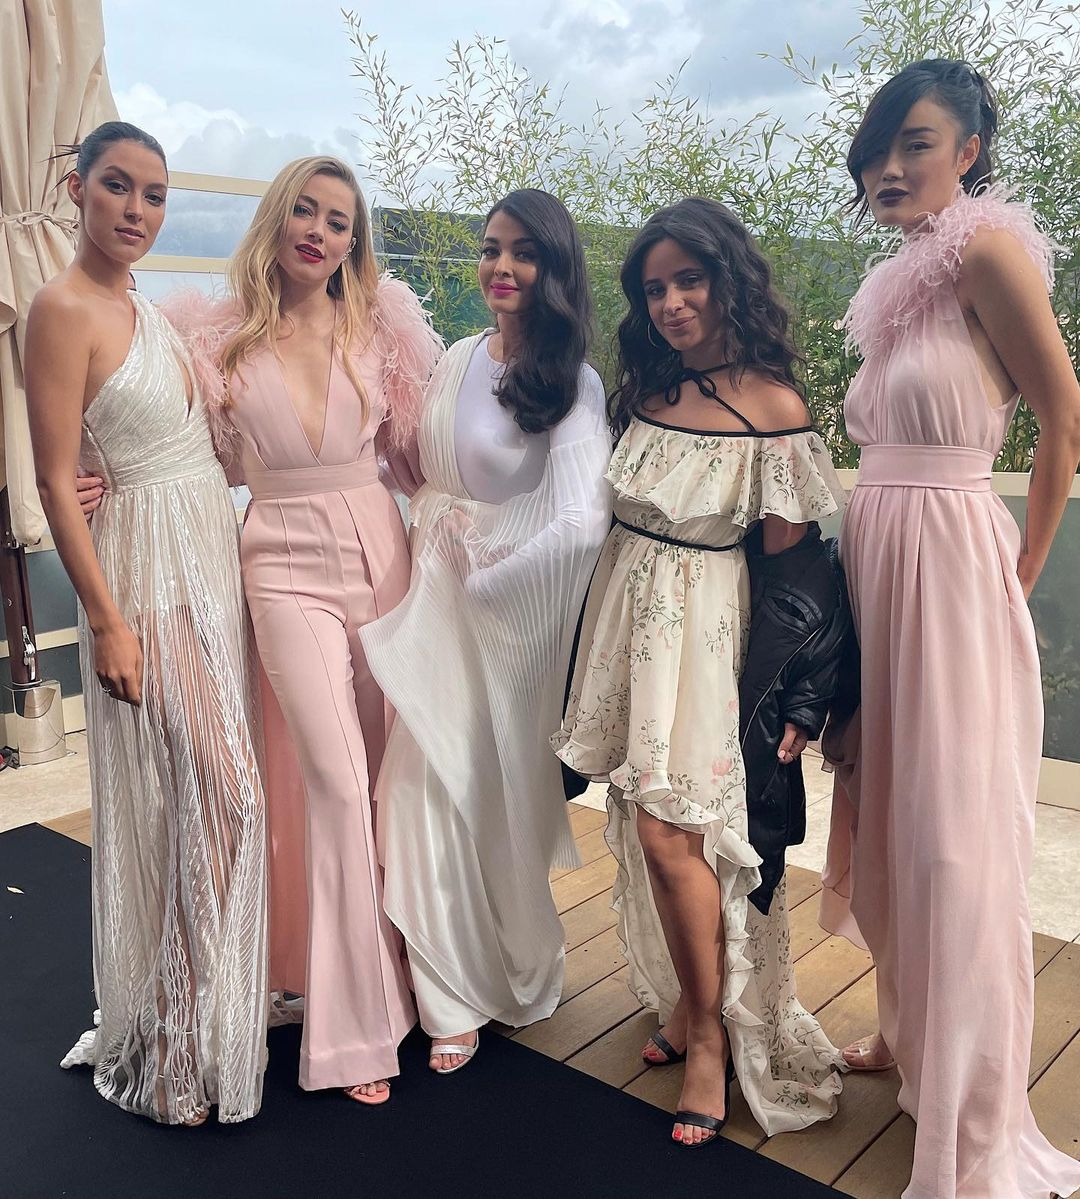 L'Oreal ambassadors take Paris Fashion Week by storm